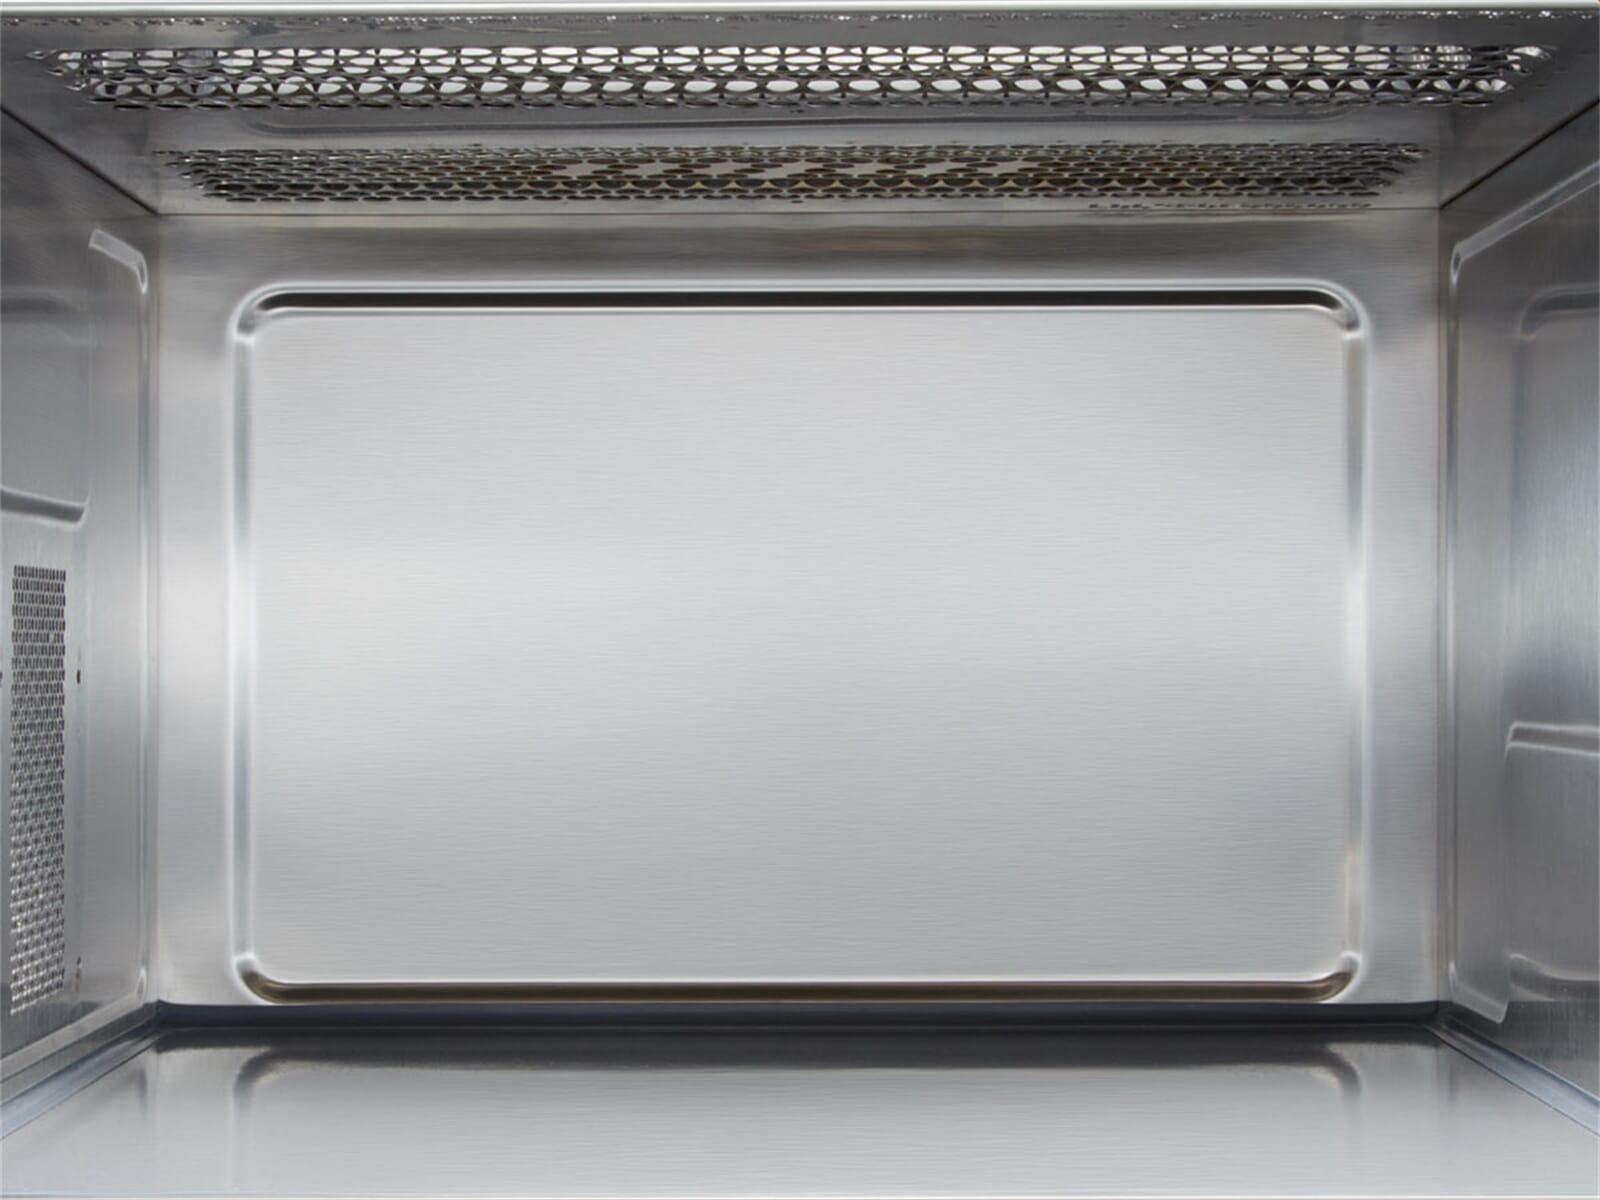 neff cgr 1700 n einbau mikrowelle edelstahl. Black Bedroom Furniture Sets. Home Design Ideas